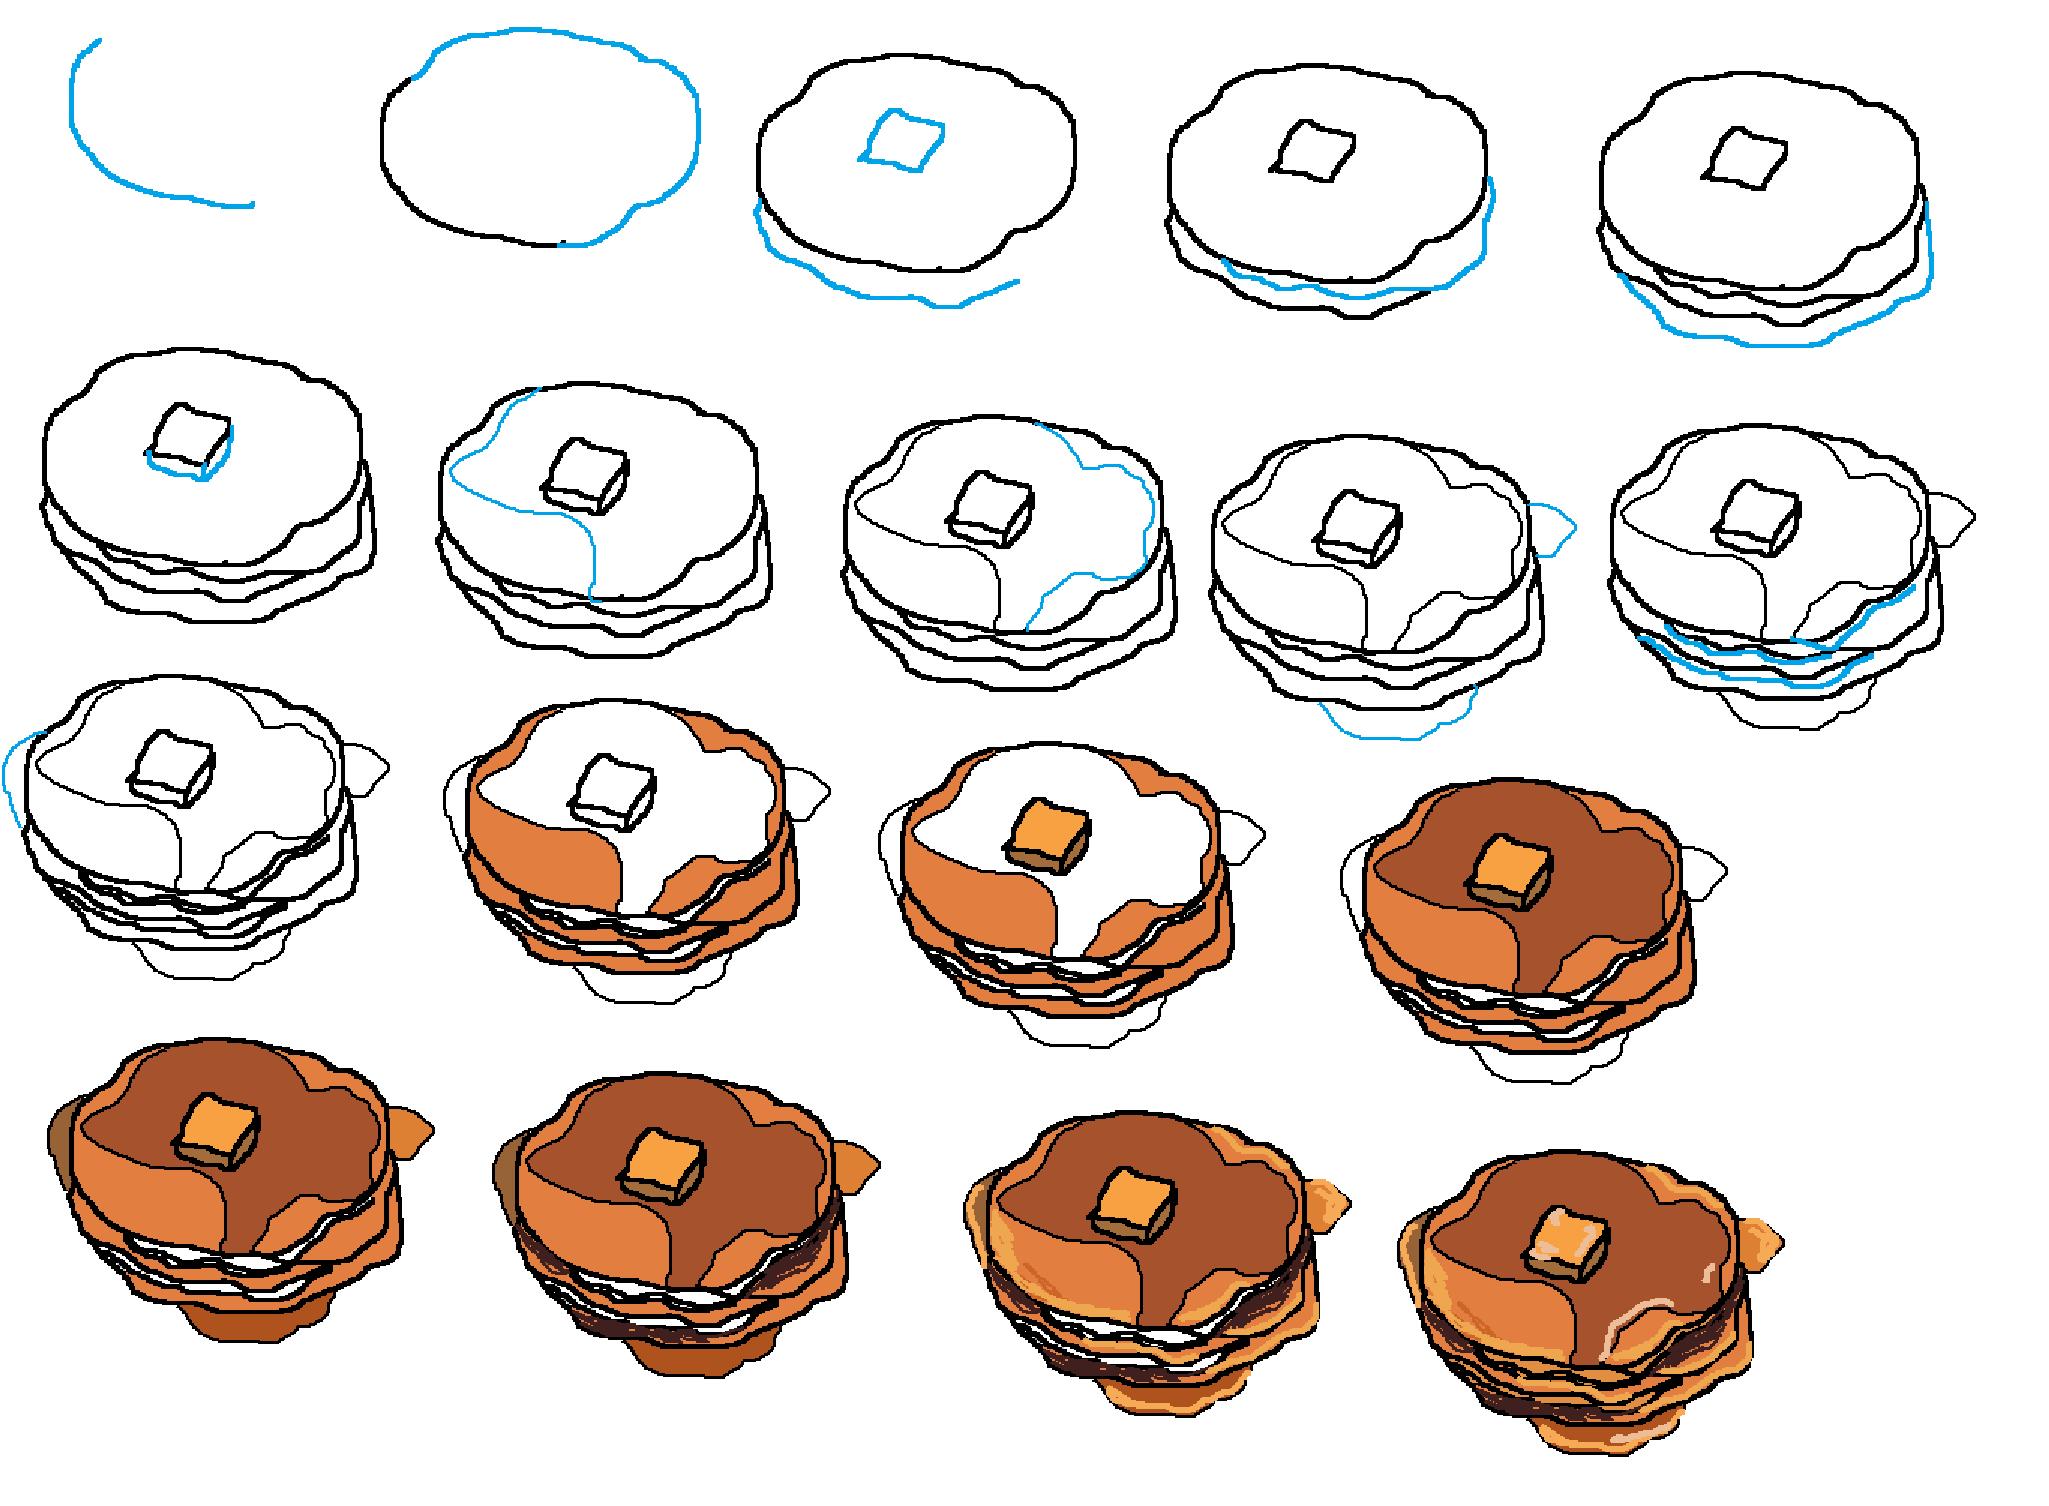 Drawn pancake Thiebaud Wayne How Pinterest To